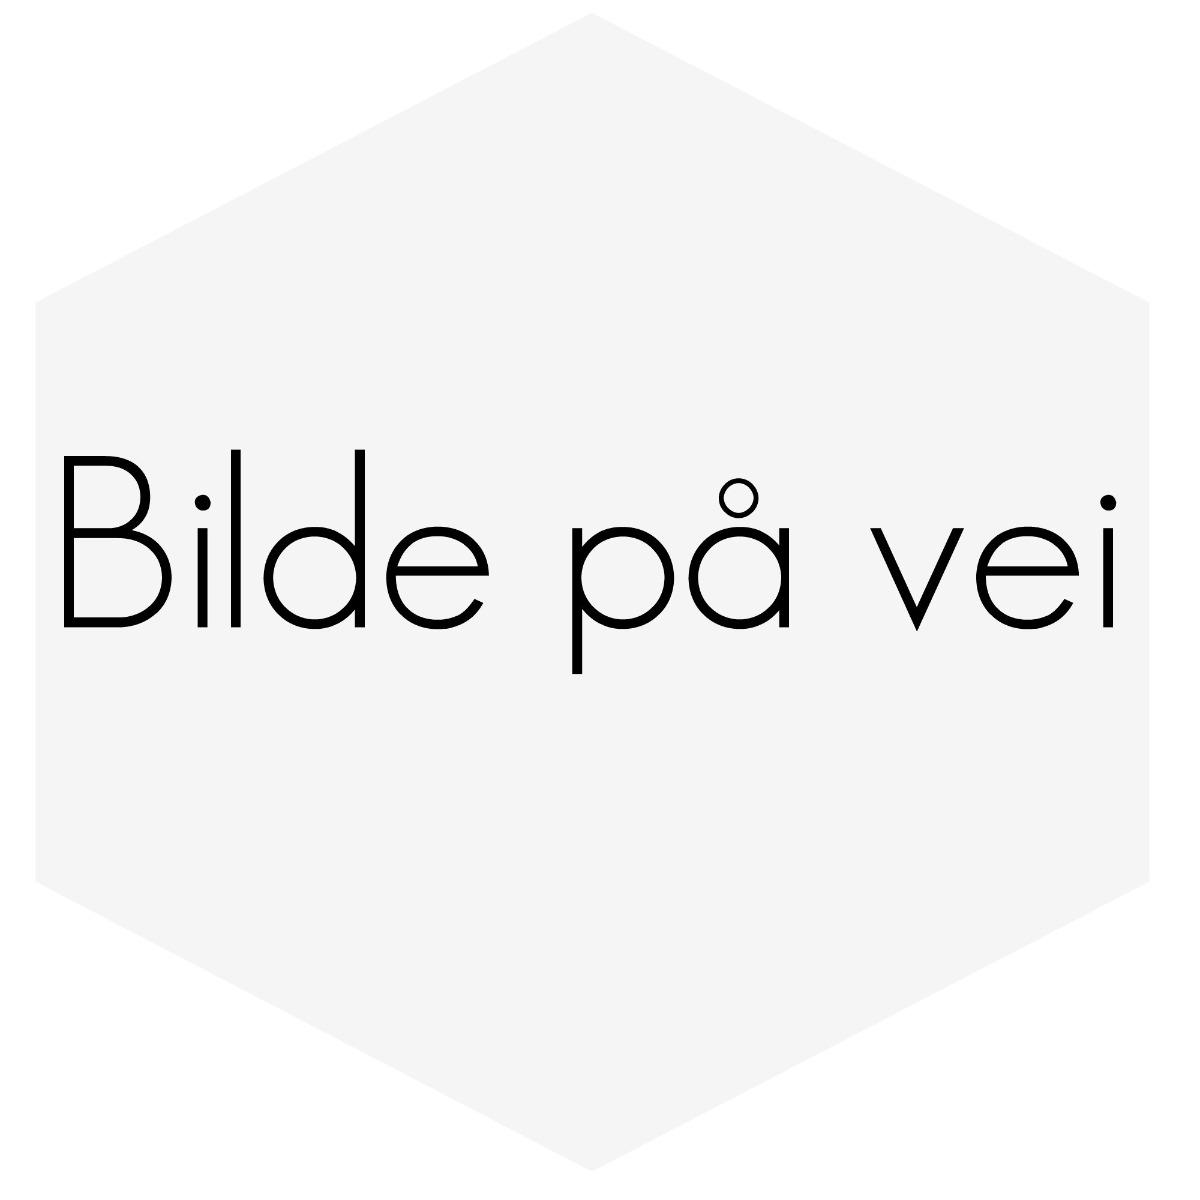 BREMSESLANGE VOLVO 140 67-74MOD (2) FORAN  stk pris